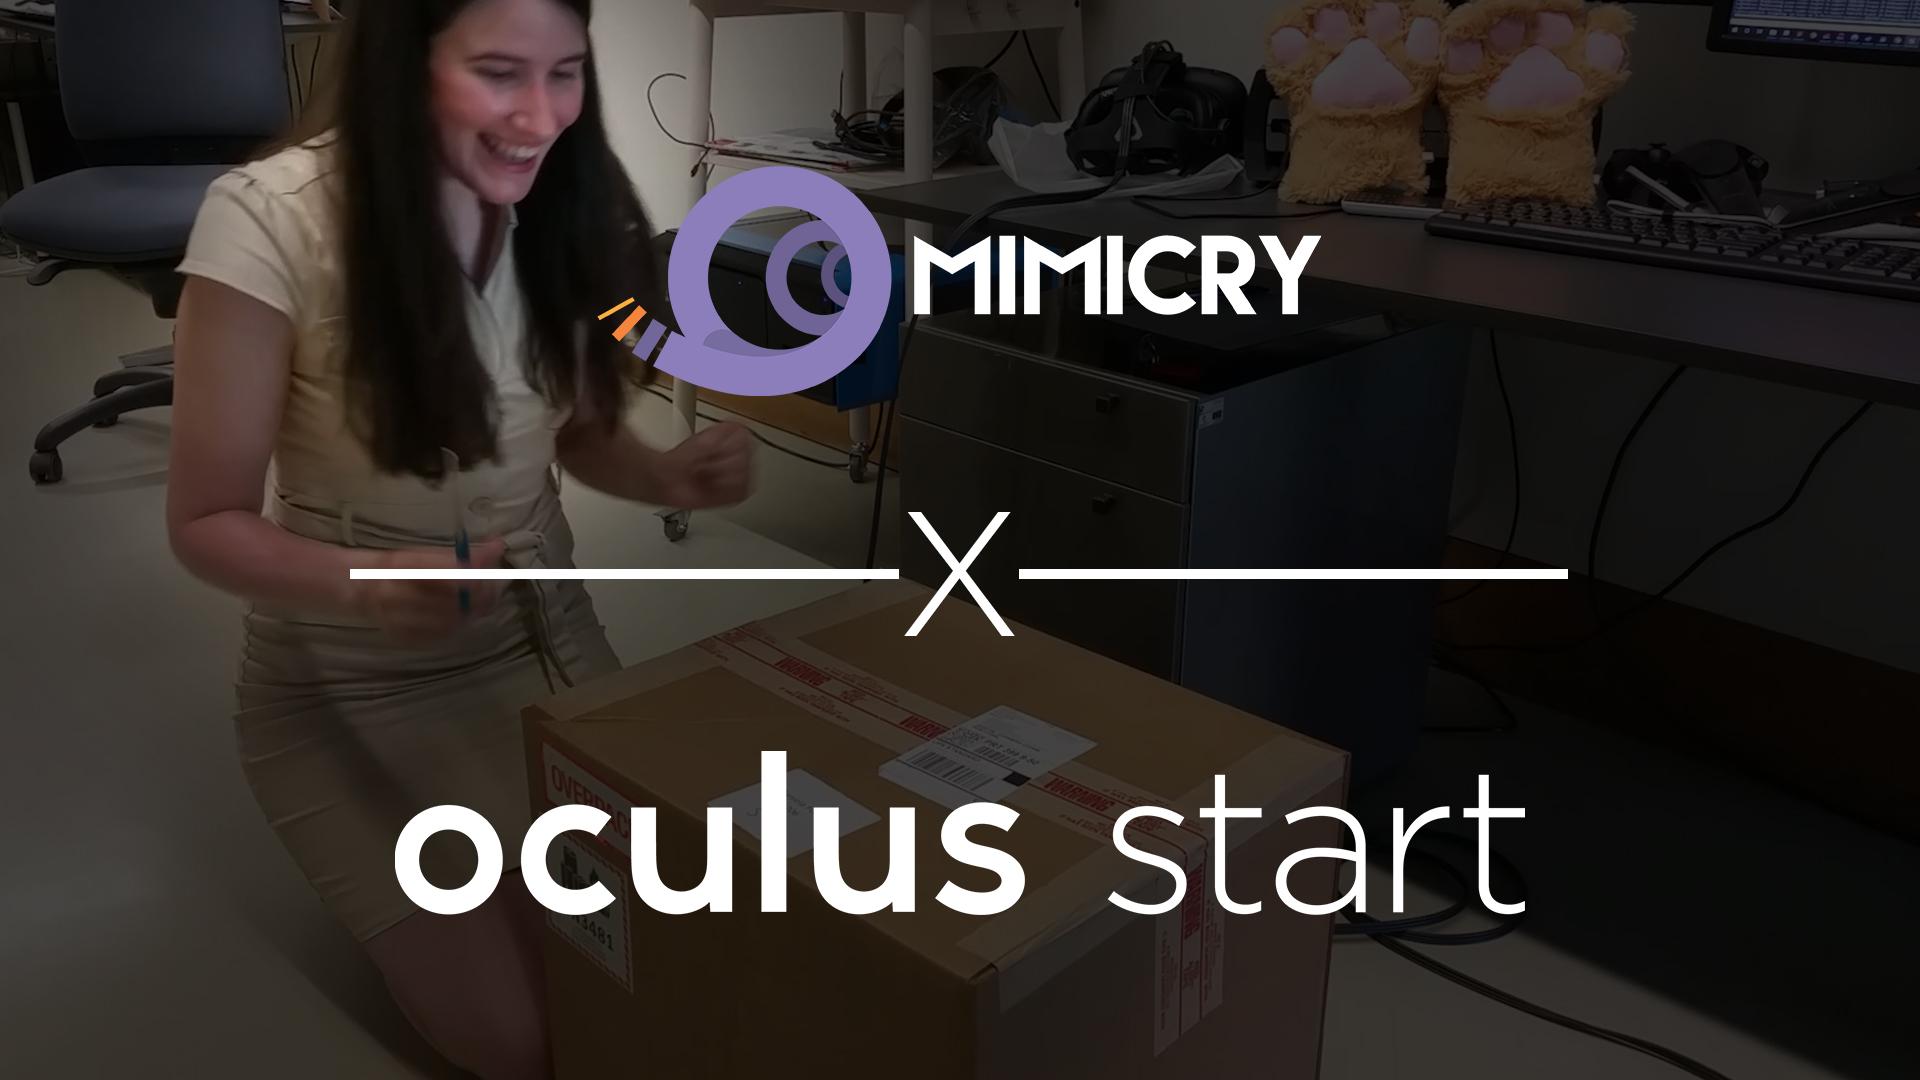 Mimicry joins Oculus start program